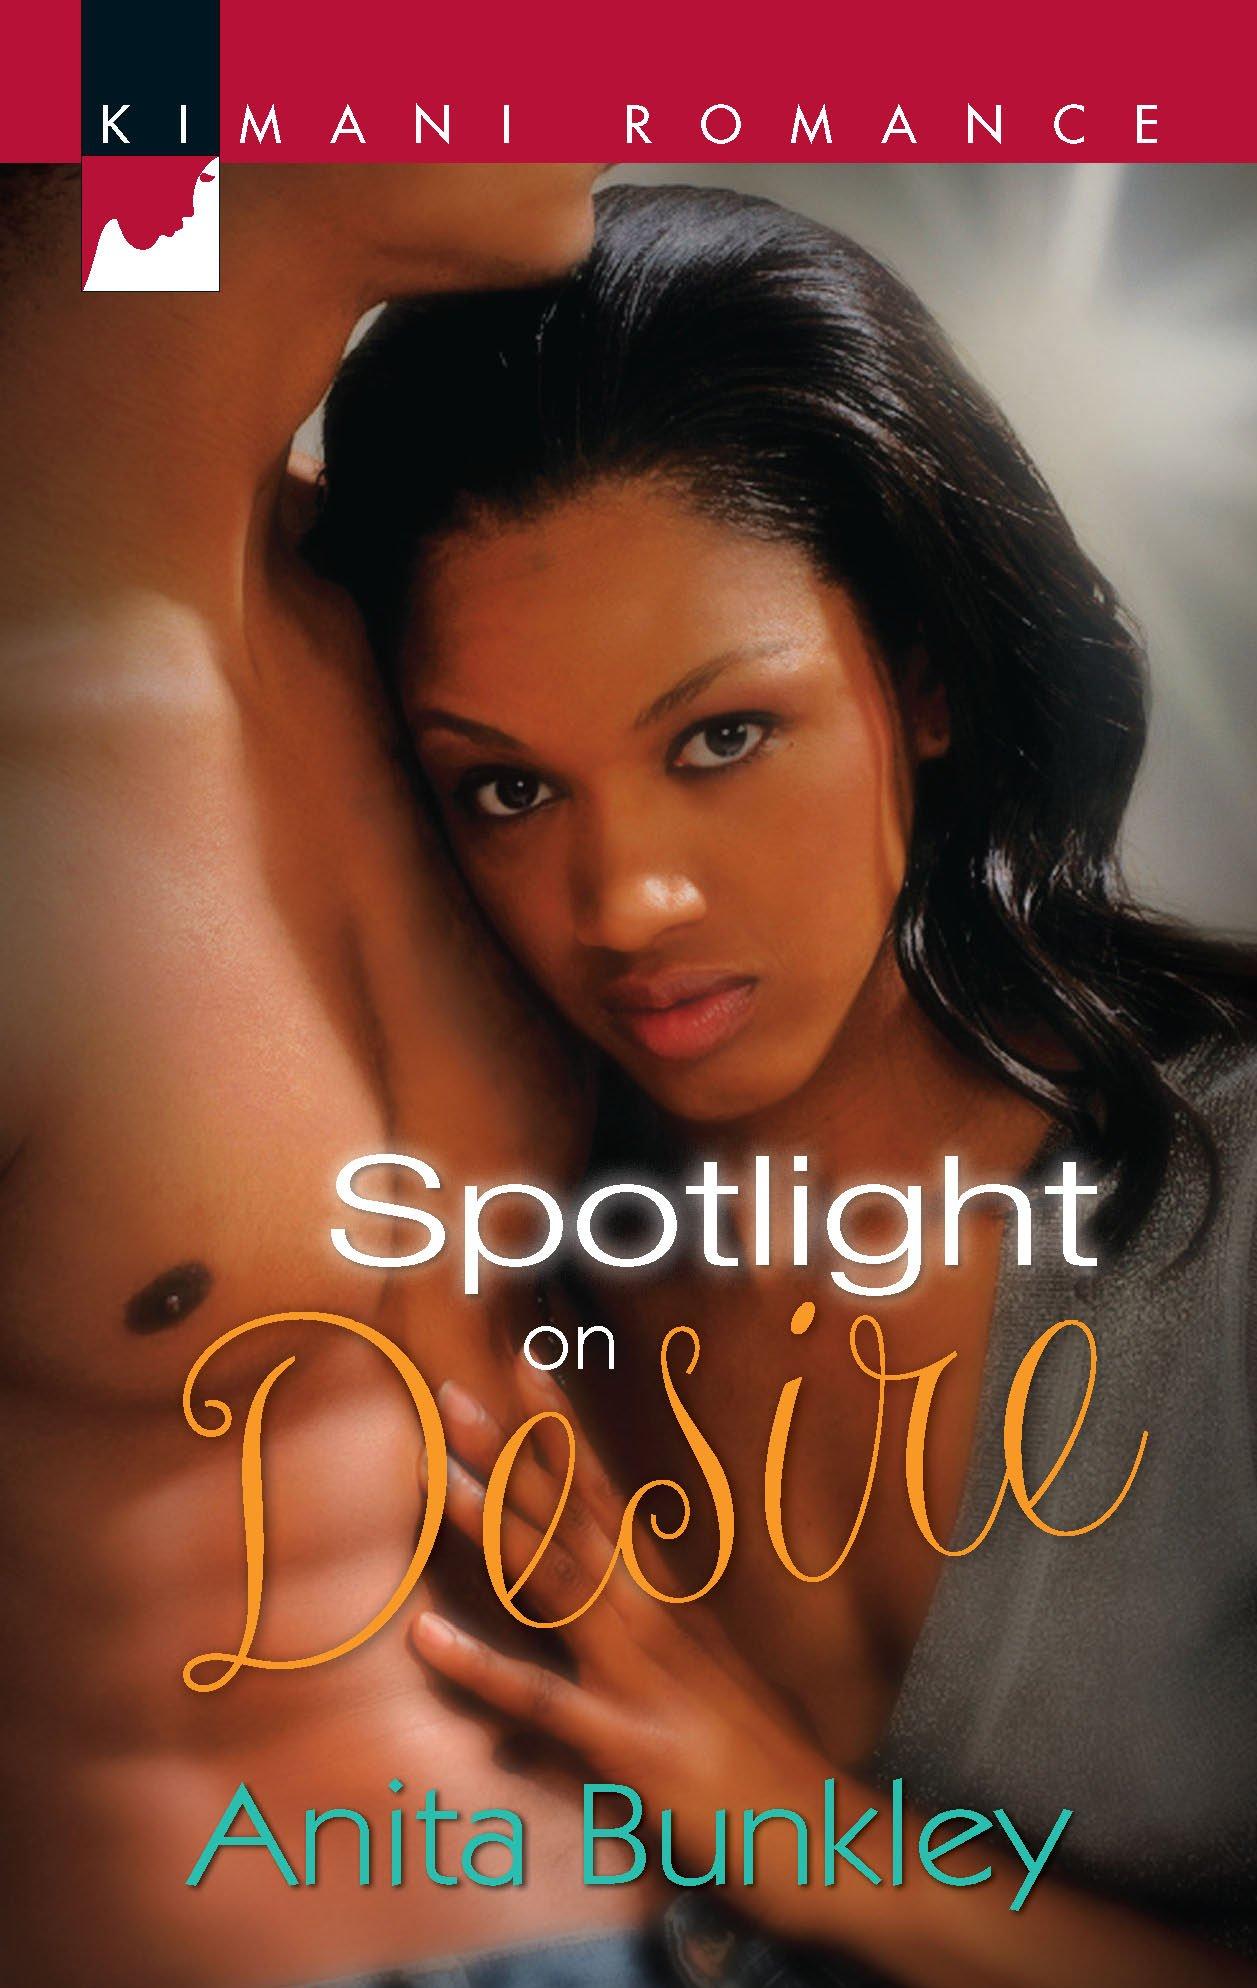 Amazon.com: Spotlight on Desire (Kimani Romance) (9780373861163): Anita  Bunkley: Books